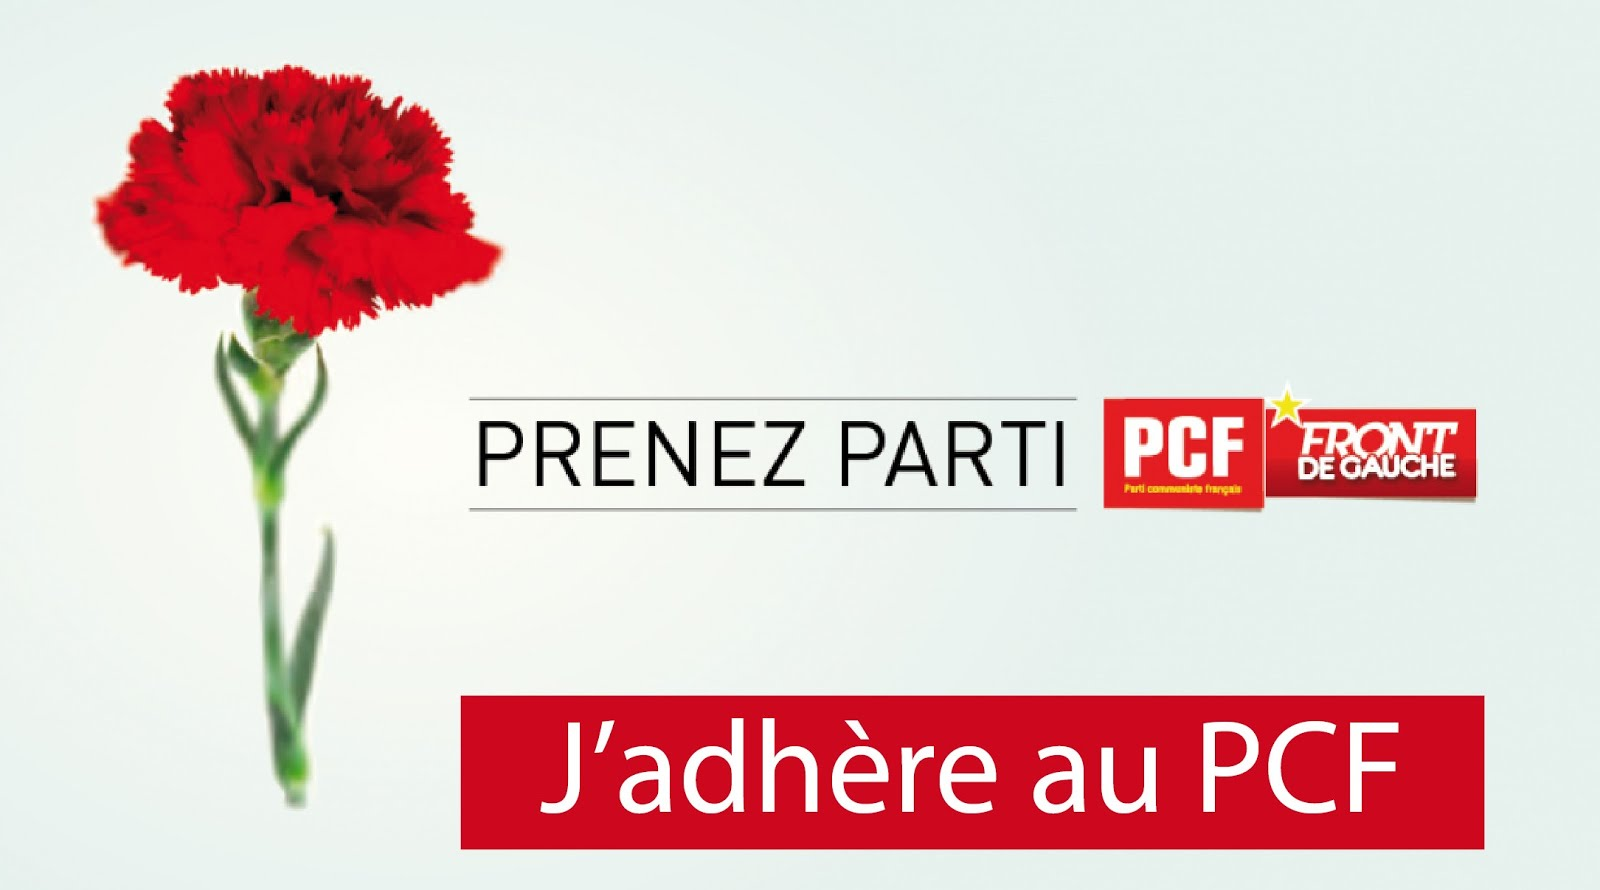 Adhérer au PCF